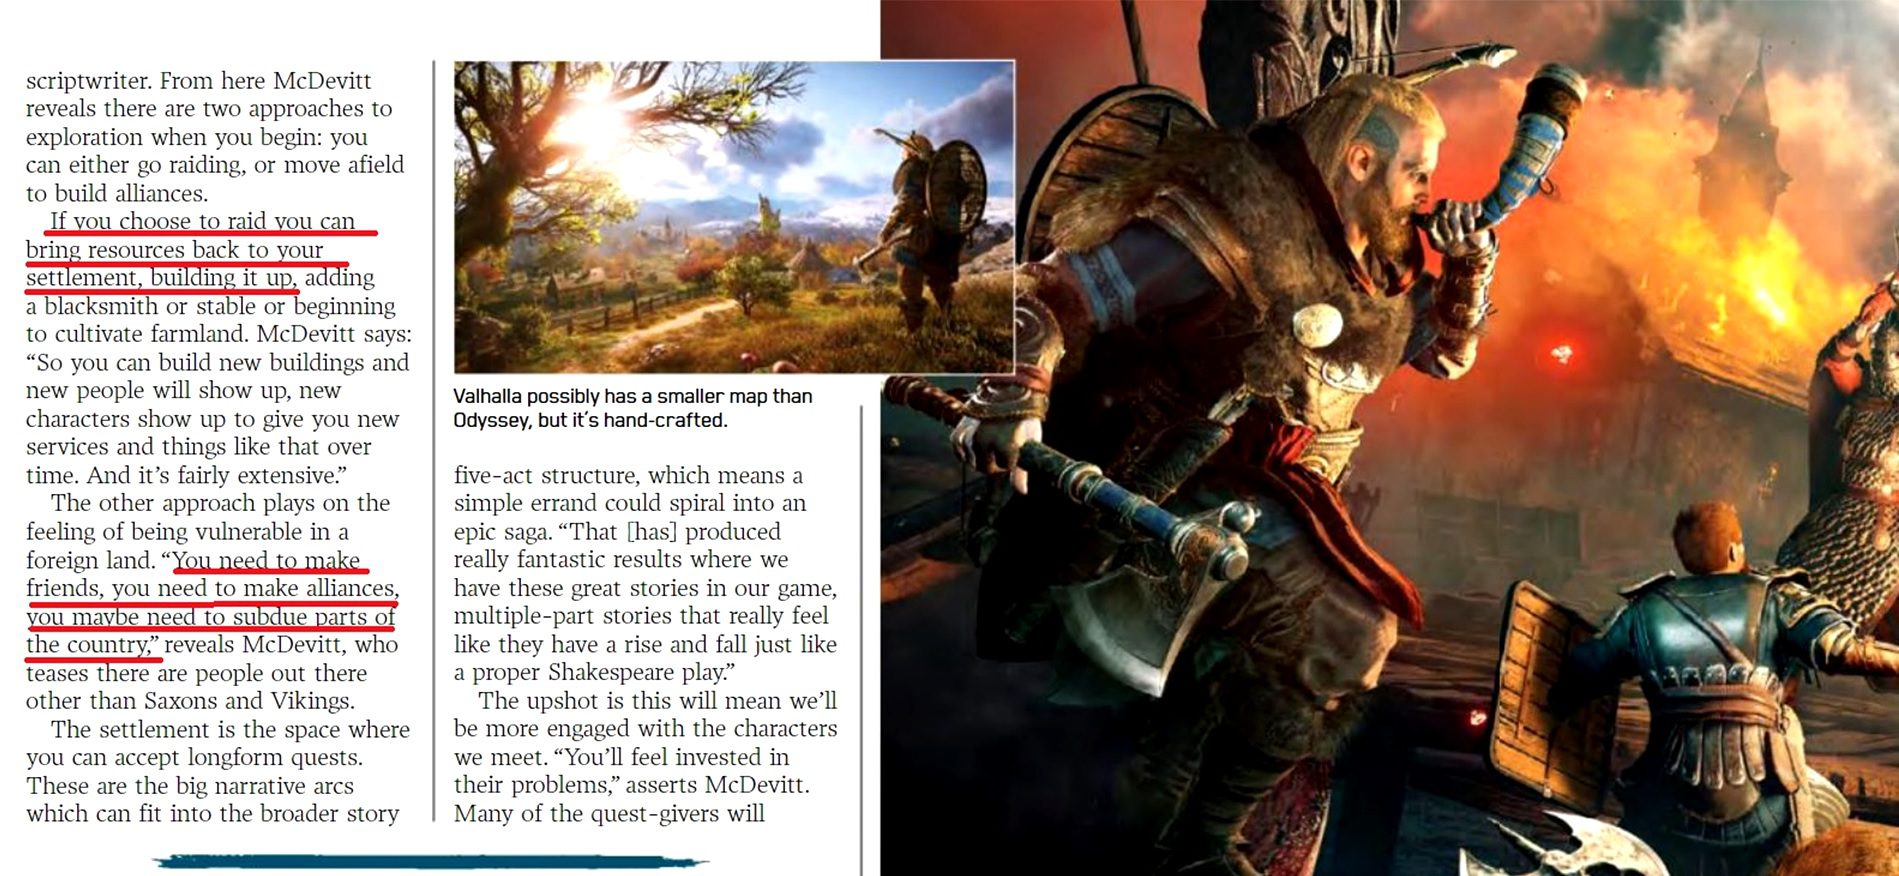 Assassin's Creed Valhalla Settlement Upgrades